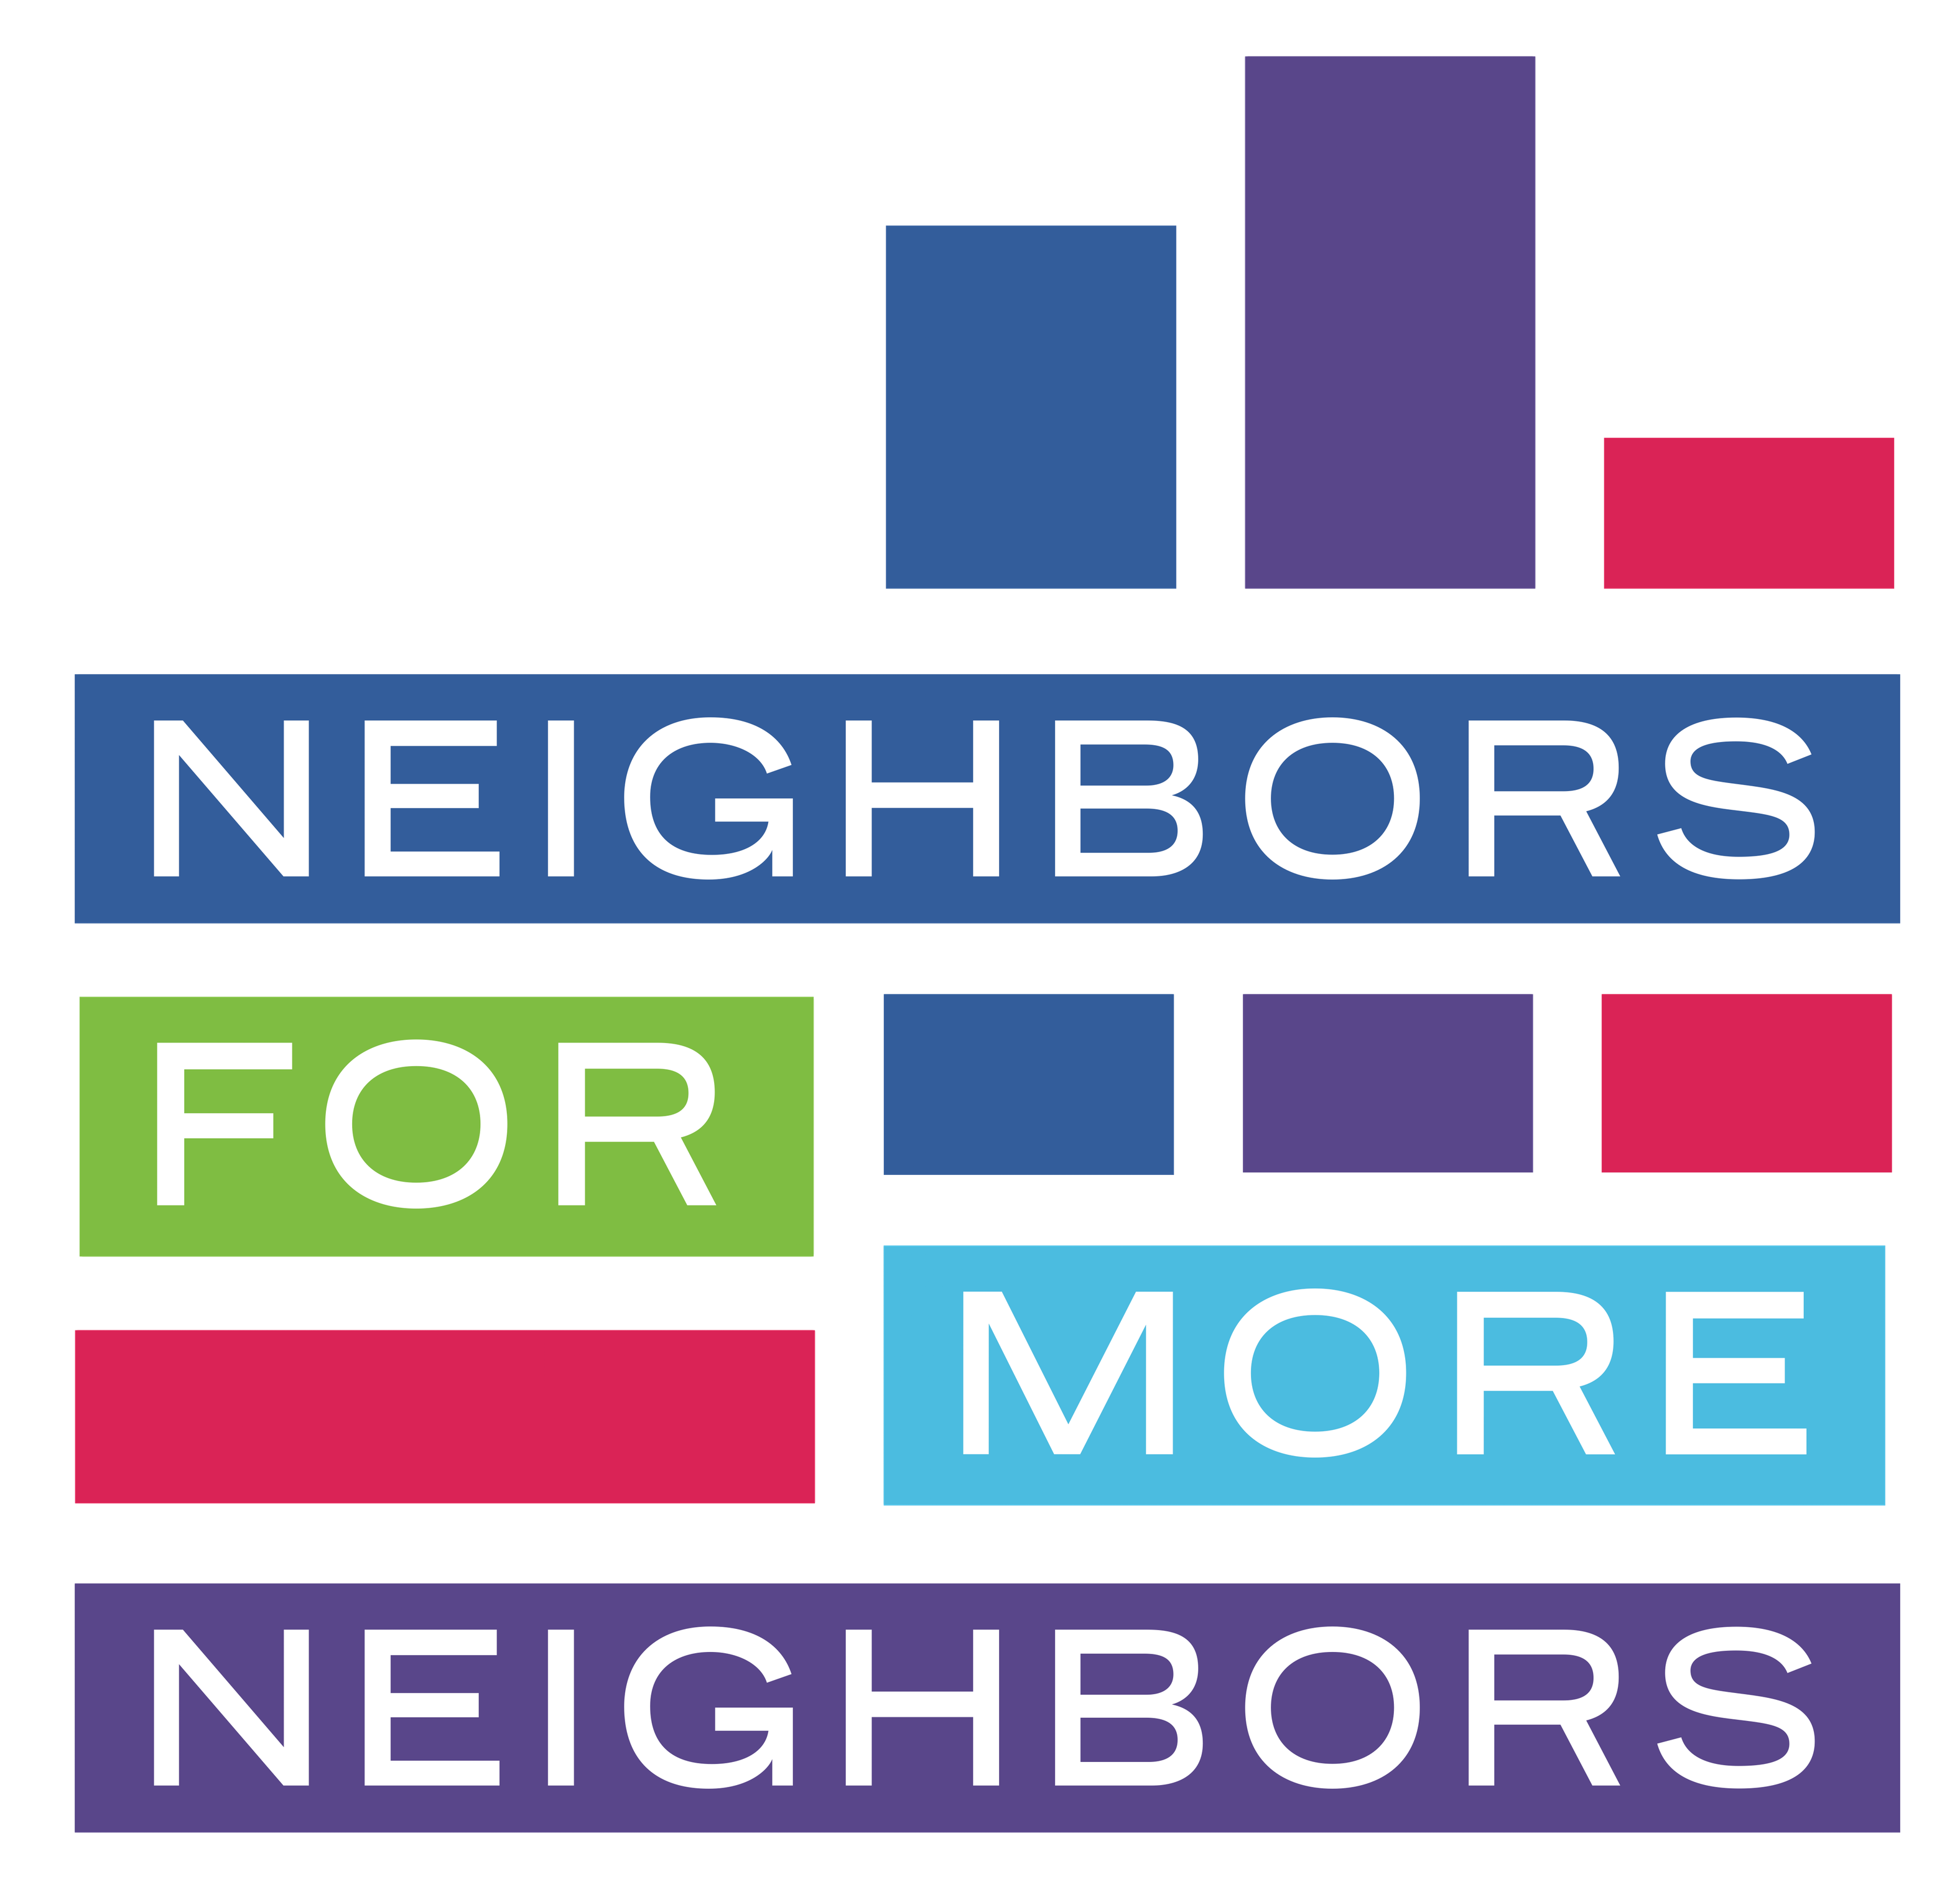 2021 Minneapolis Mayor Housing Questionnaire